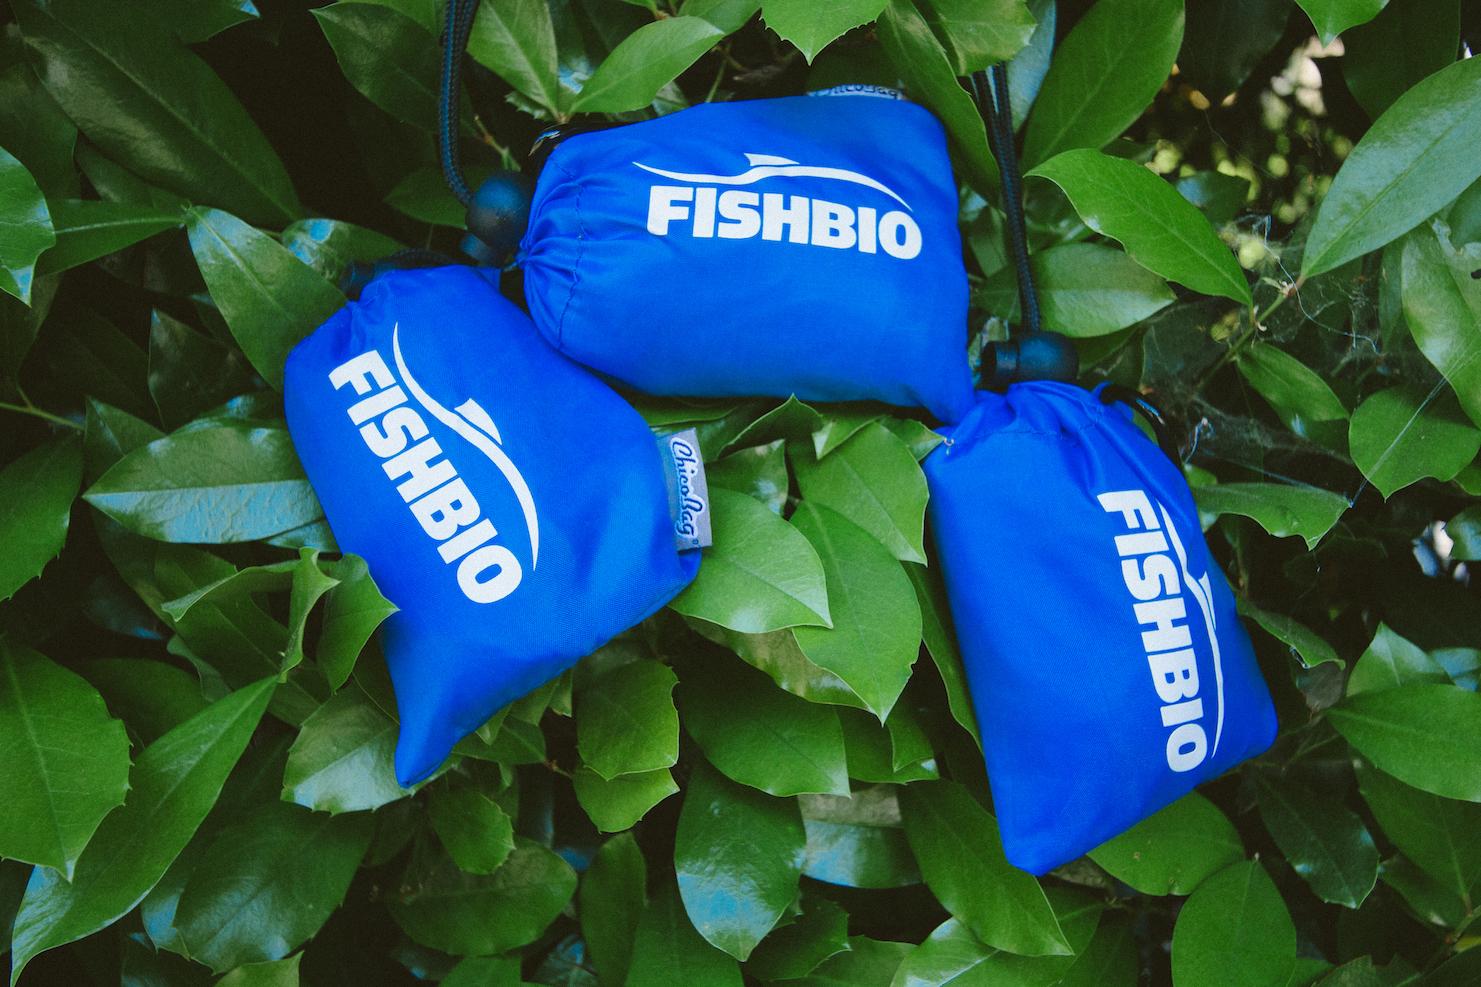 FISHBIO Chico bag